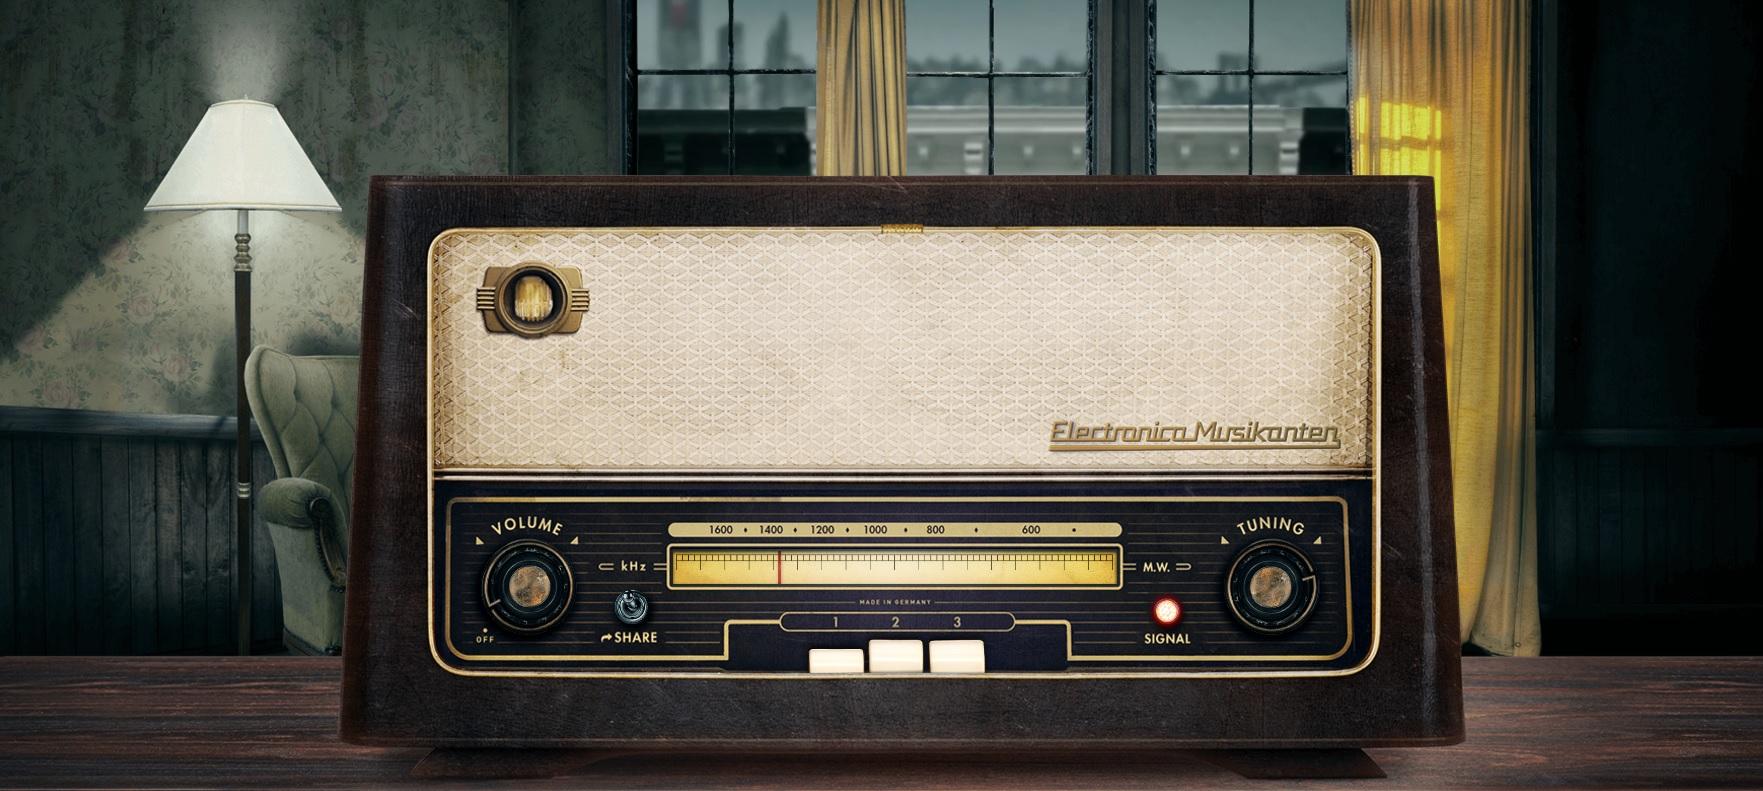 resistance-radio-image